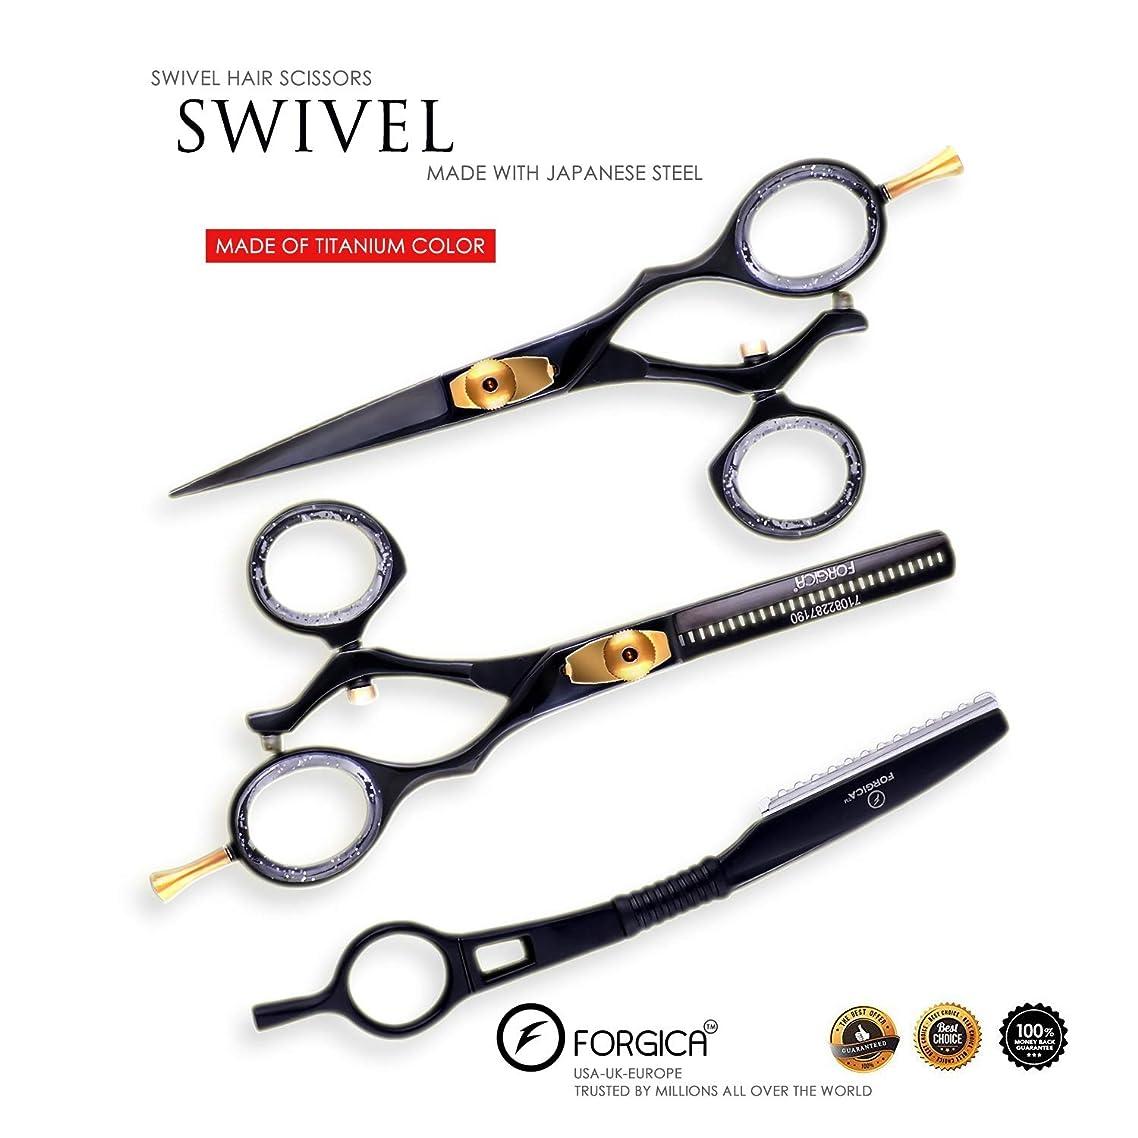 Hair Cutting Scissors/Thinning Shears/Professional Barber/Hair Straight Razor/Barber Scissors/Swivle Barber Shears with Fine Adjustment Screw Japanese Stainless Steel - Forgica (6.5)